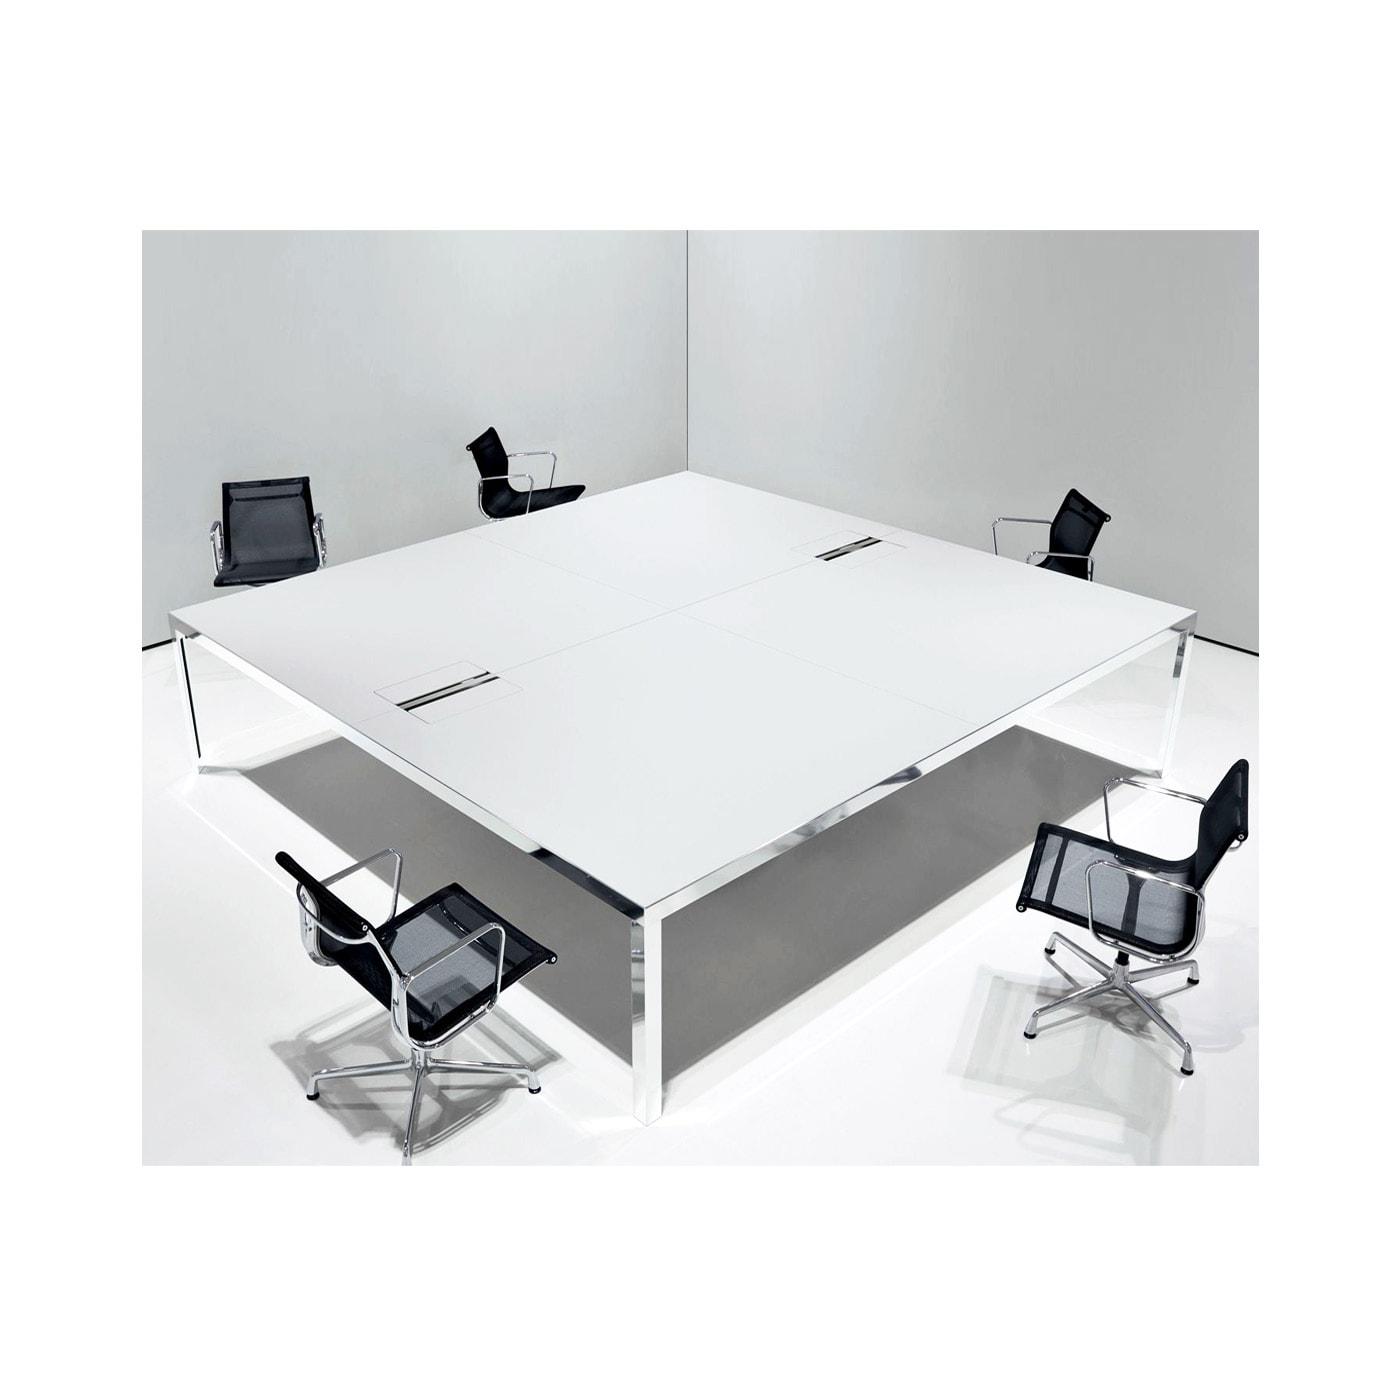 UNIFOR Naos System tavolo riunione